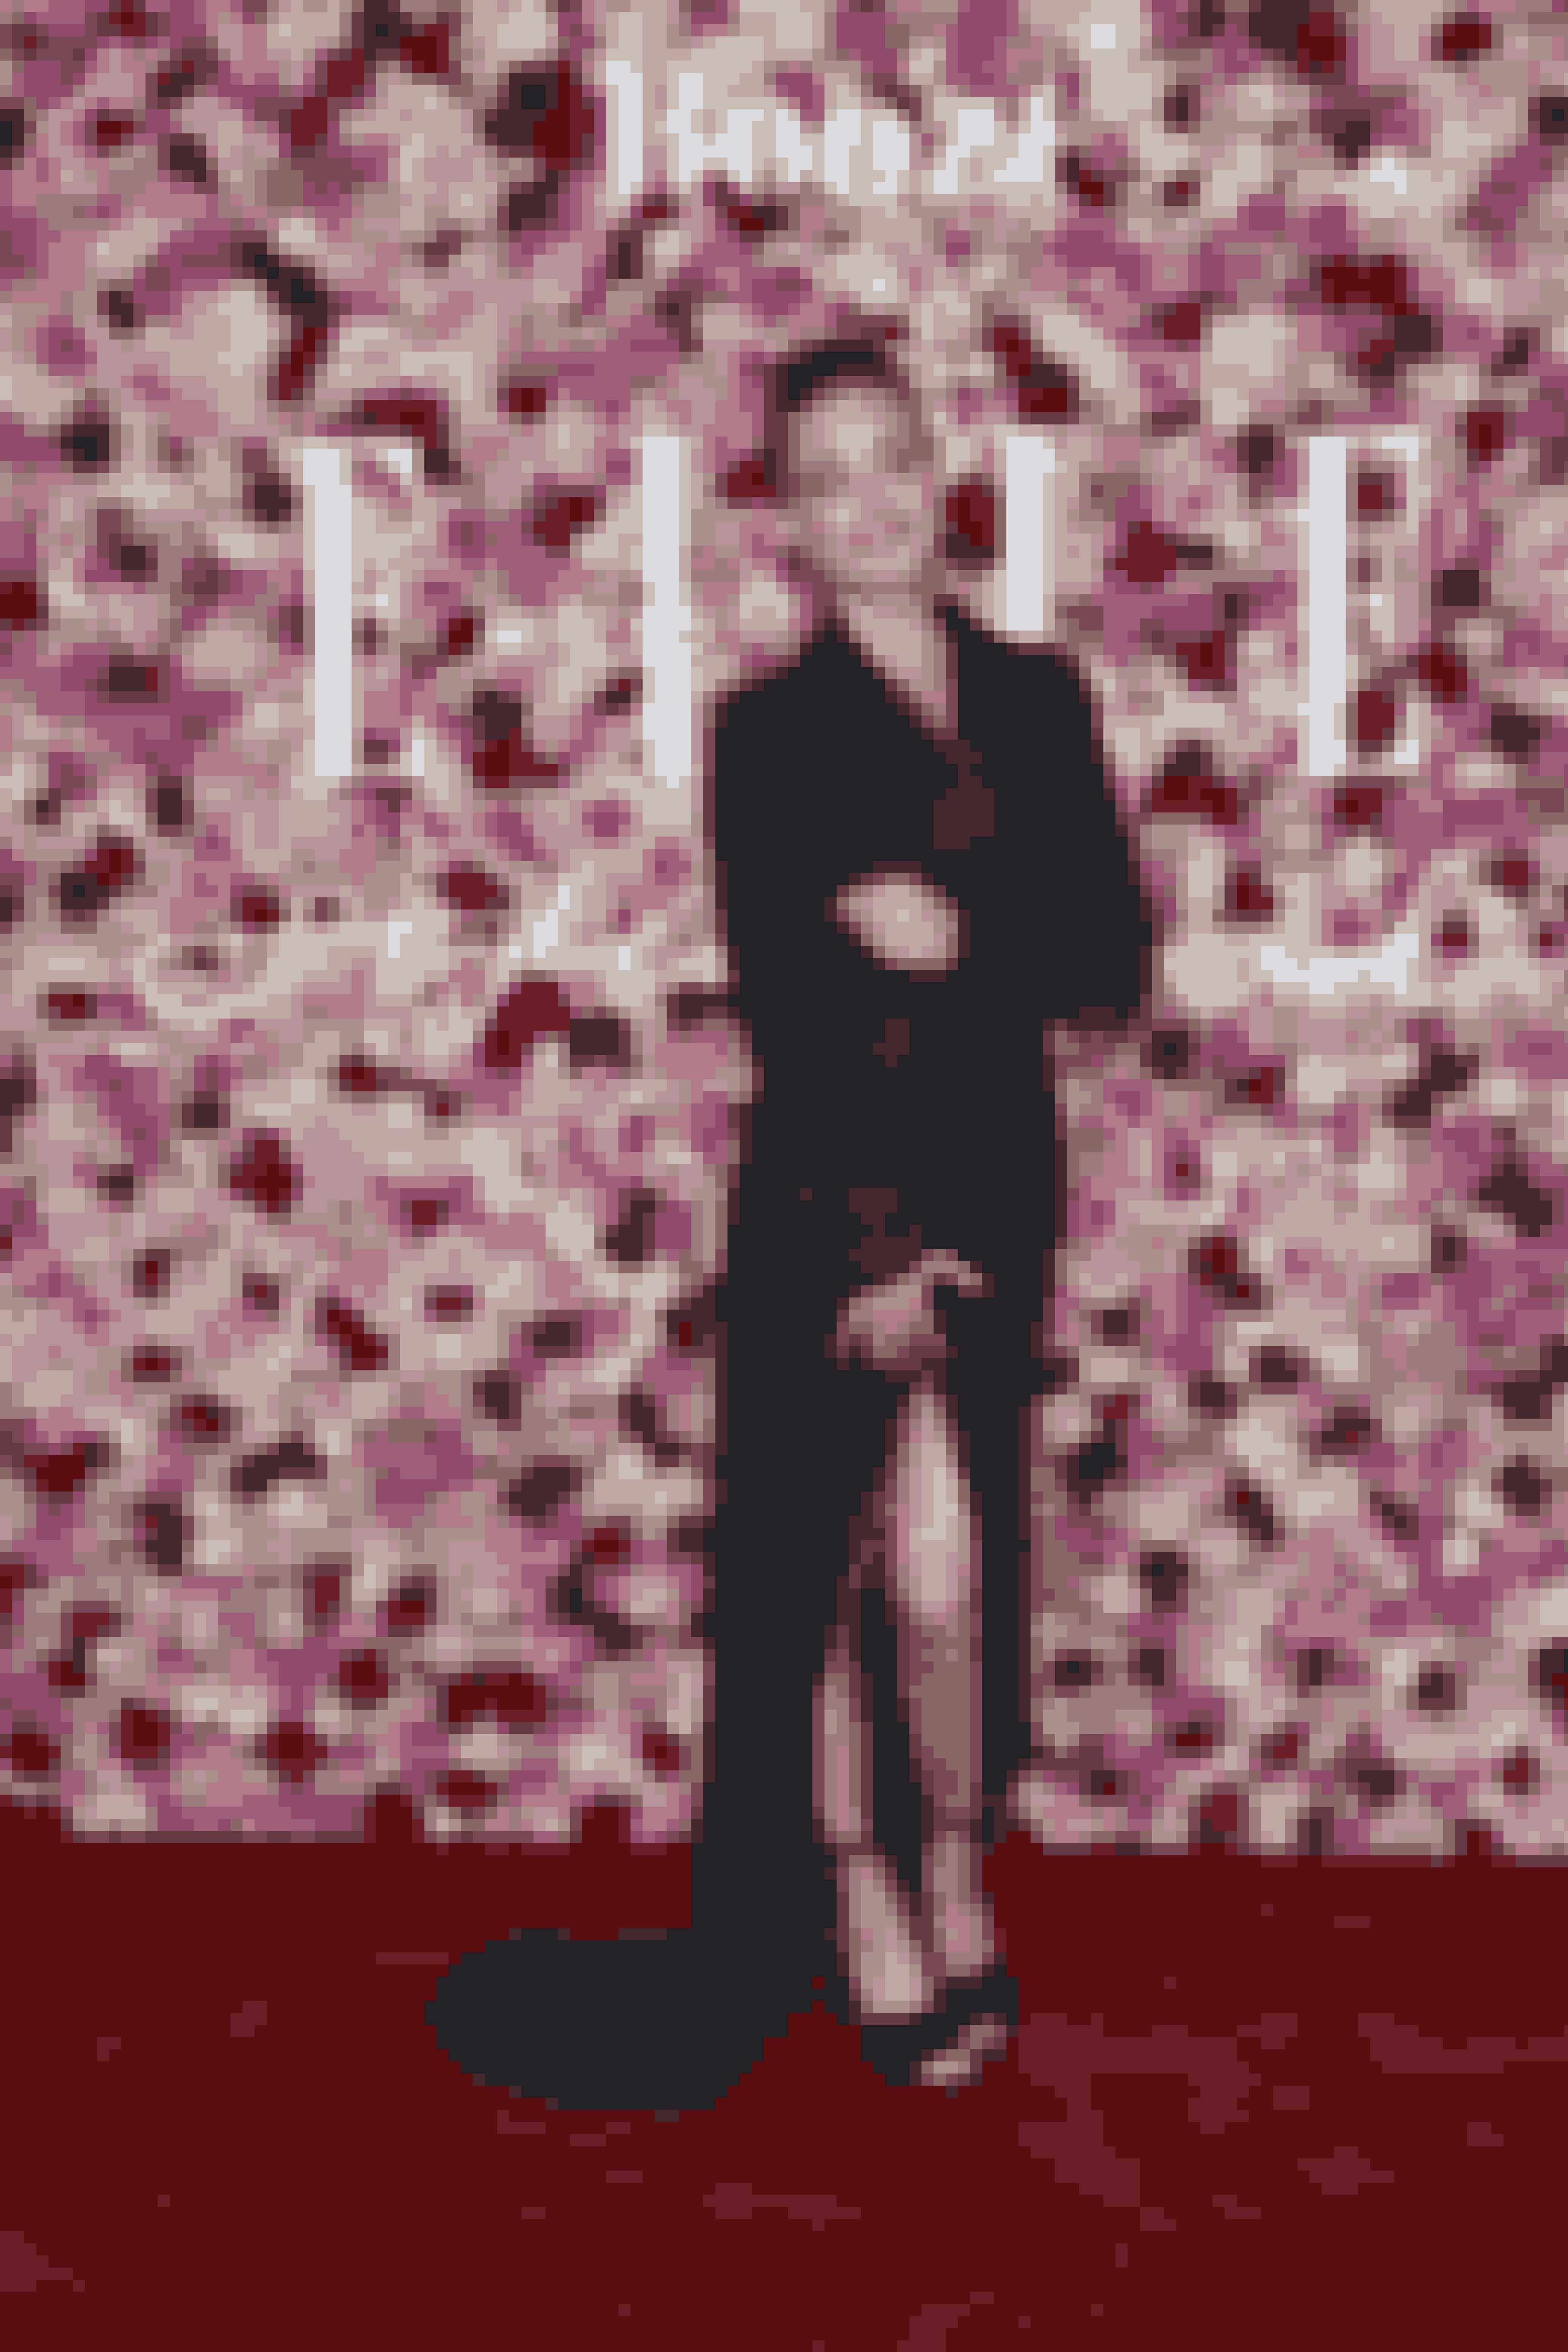 Sarah Grünewald i kjole fra Søren le Schmidt og smykker fra Maria Black.